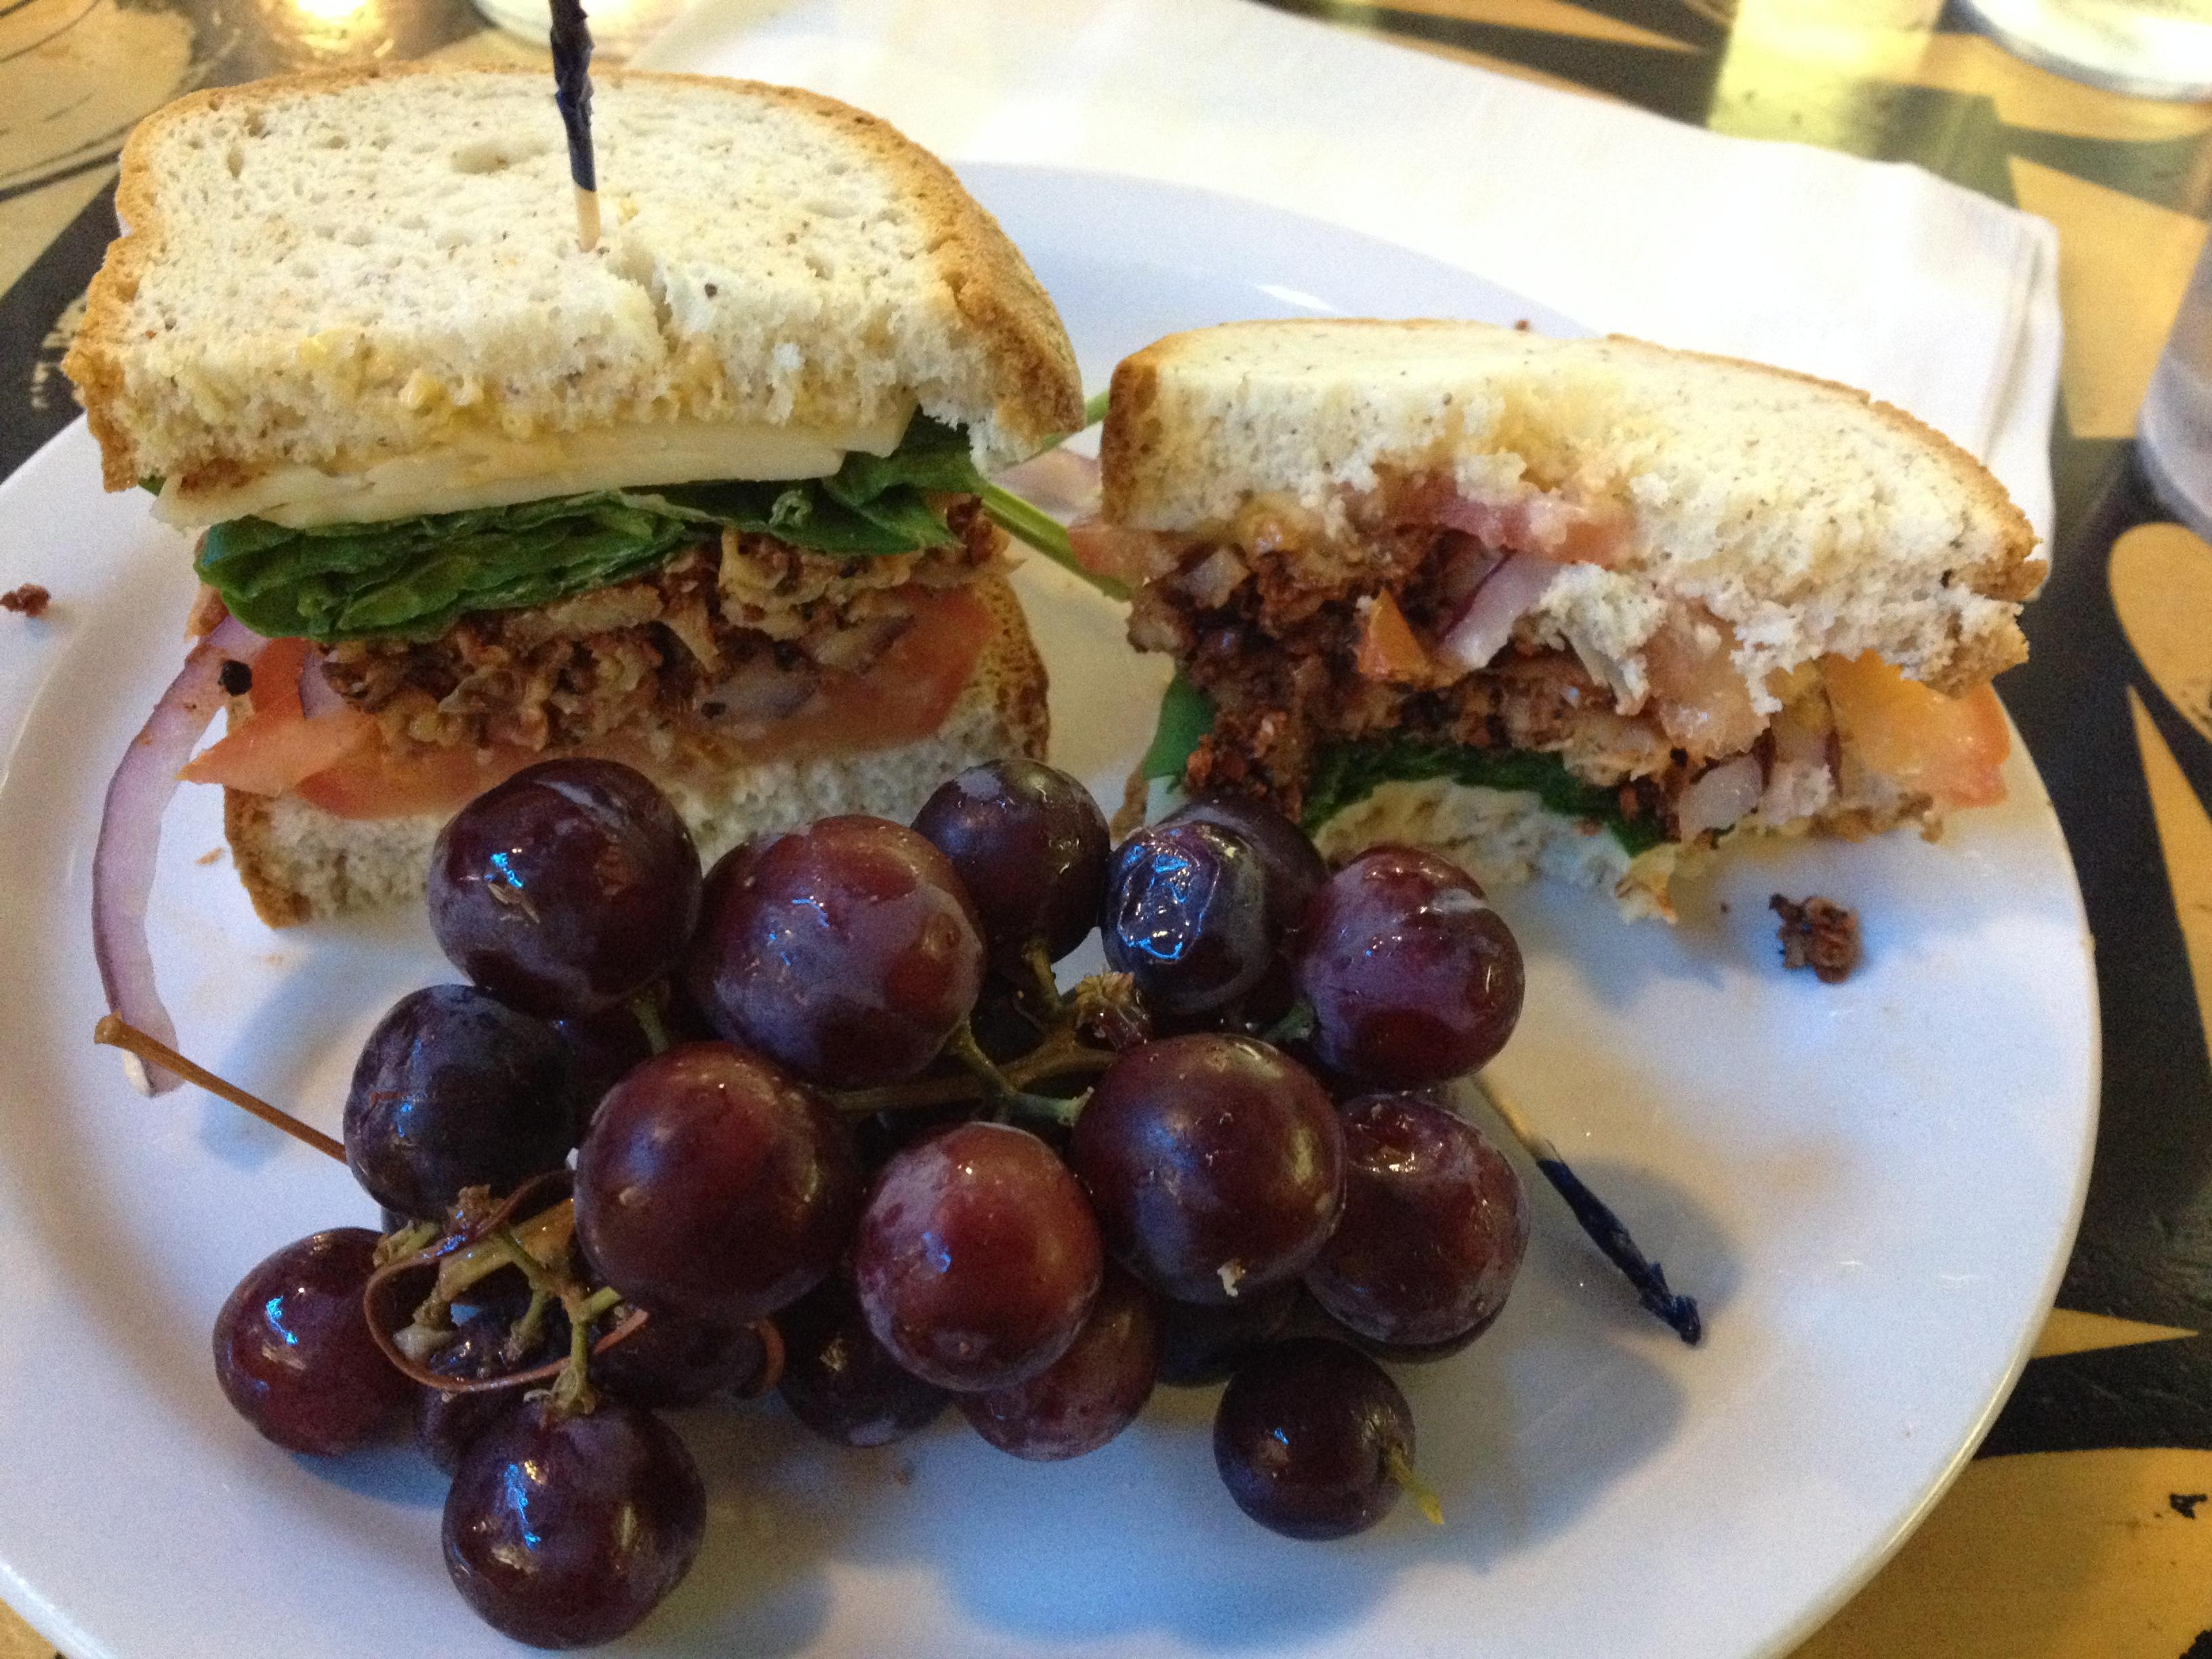 Gluten free Sandwich at Roast u0026 Toast Food